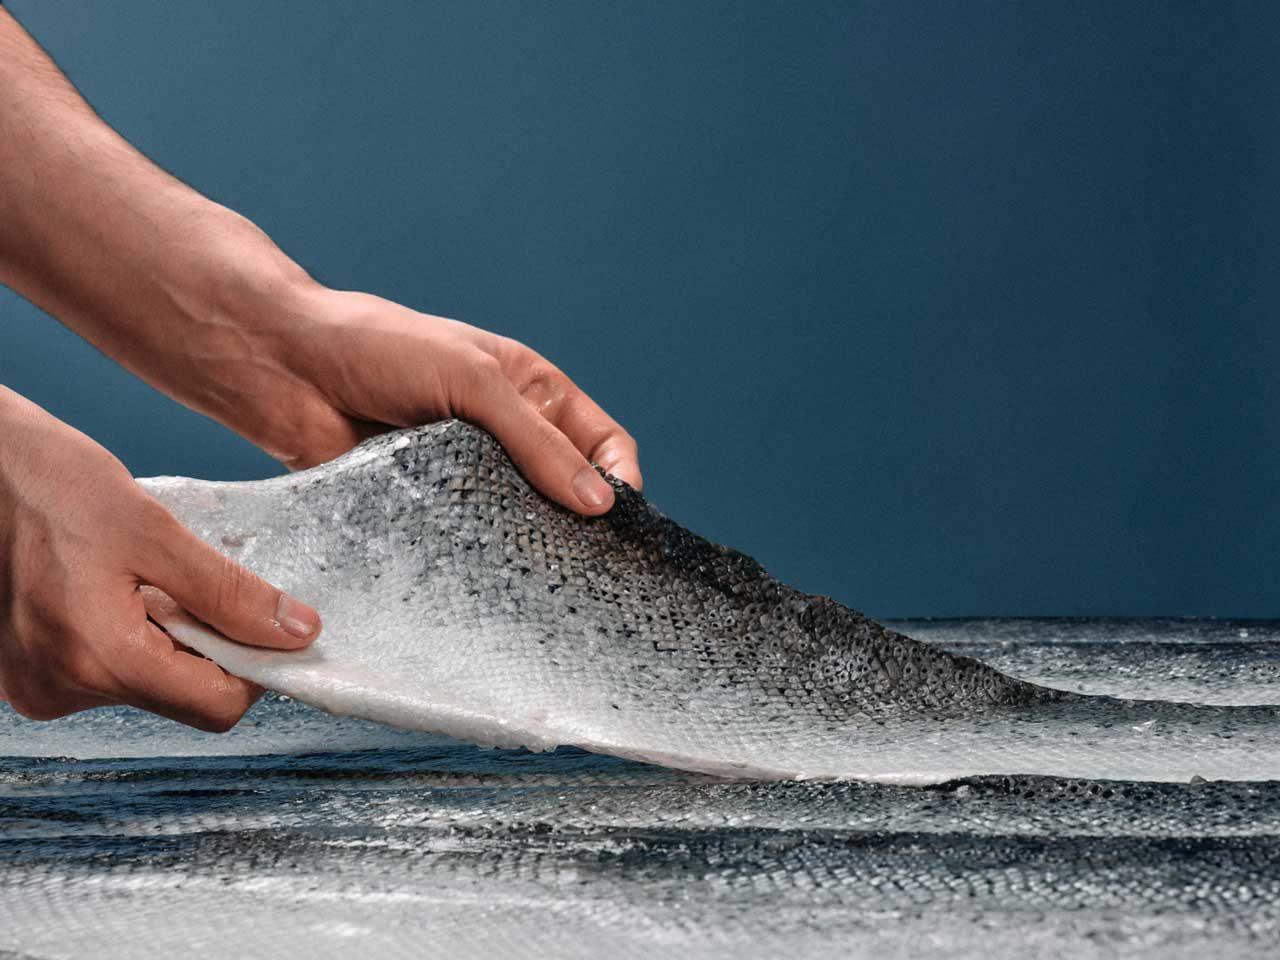 ICTYOS cuir marin France-zero-dechet-recyclage peau poisson